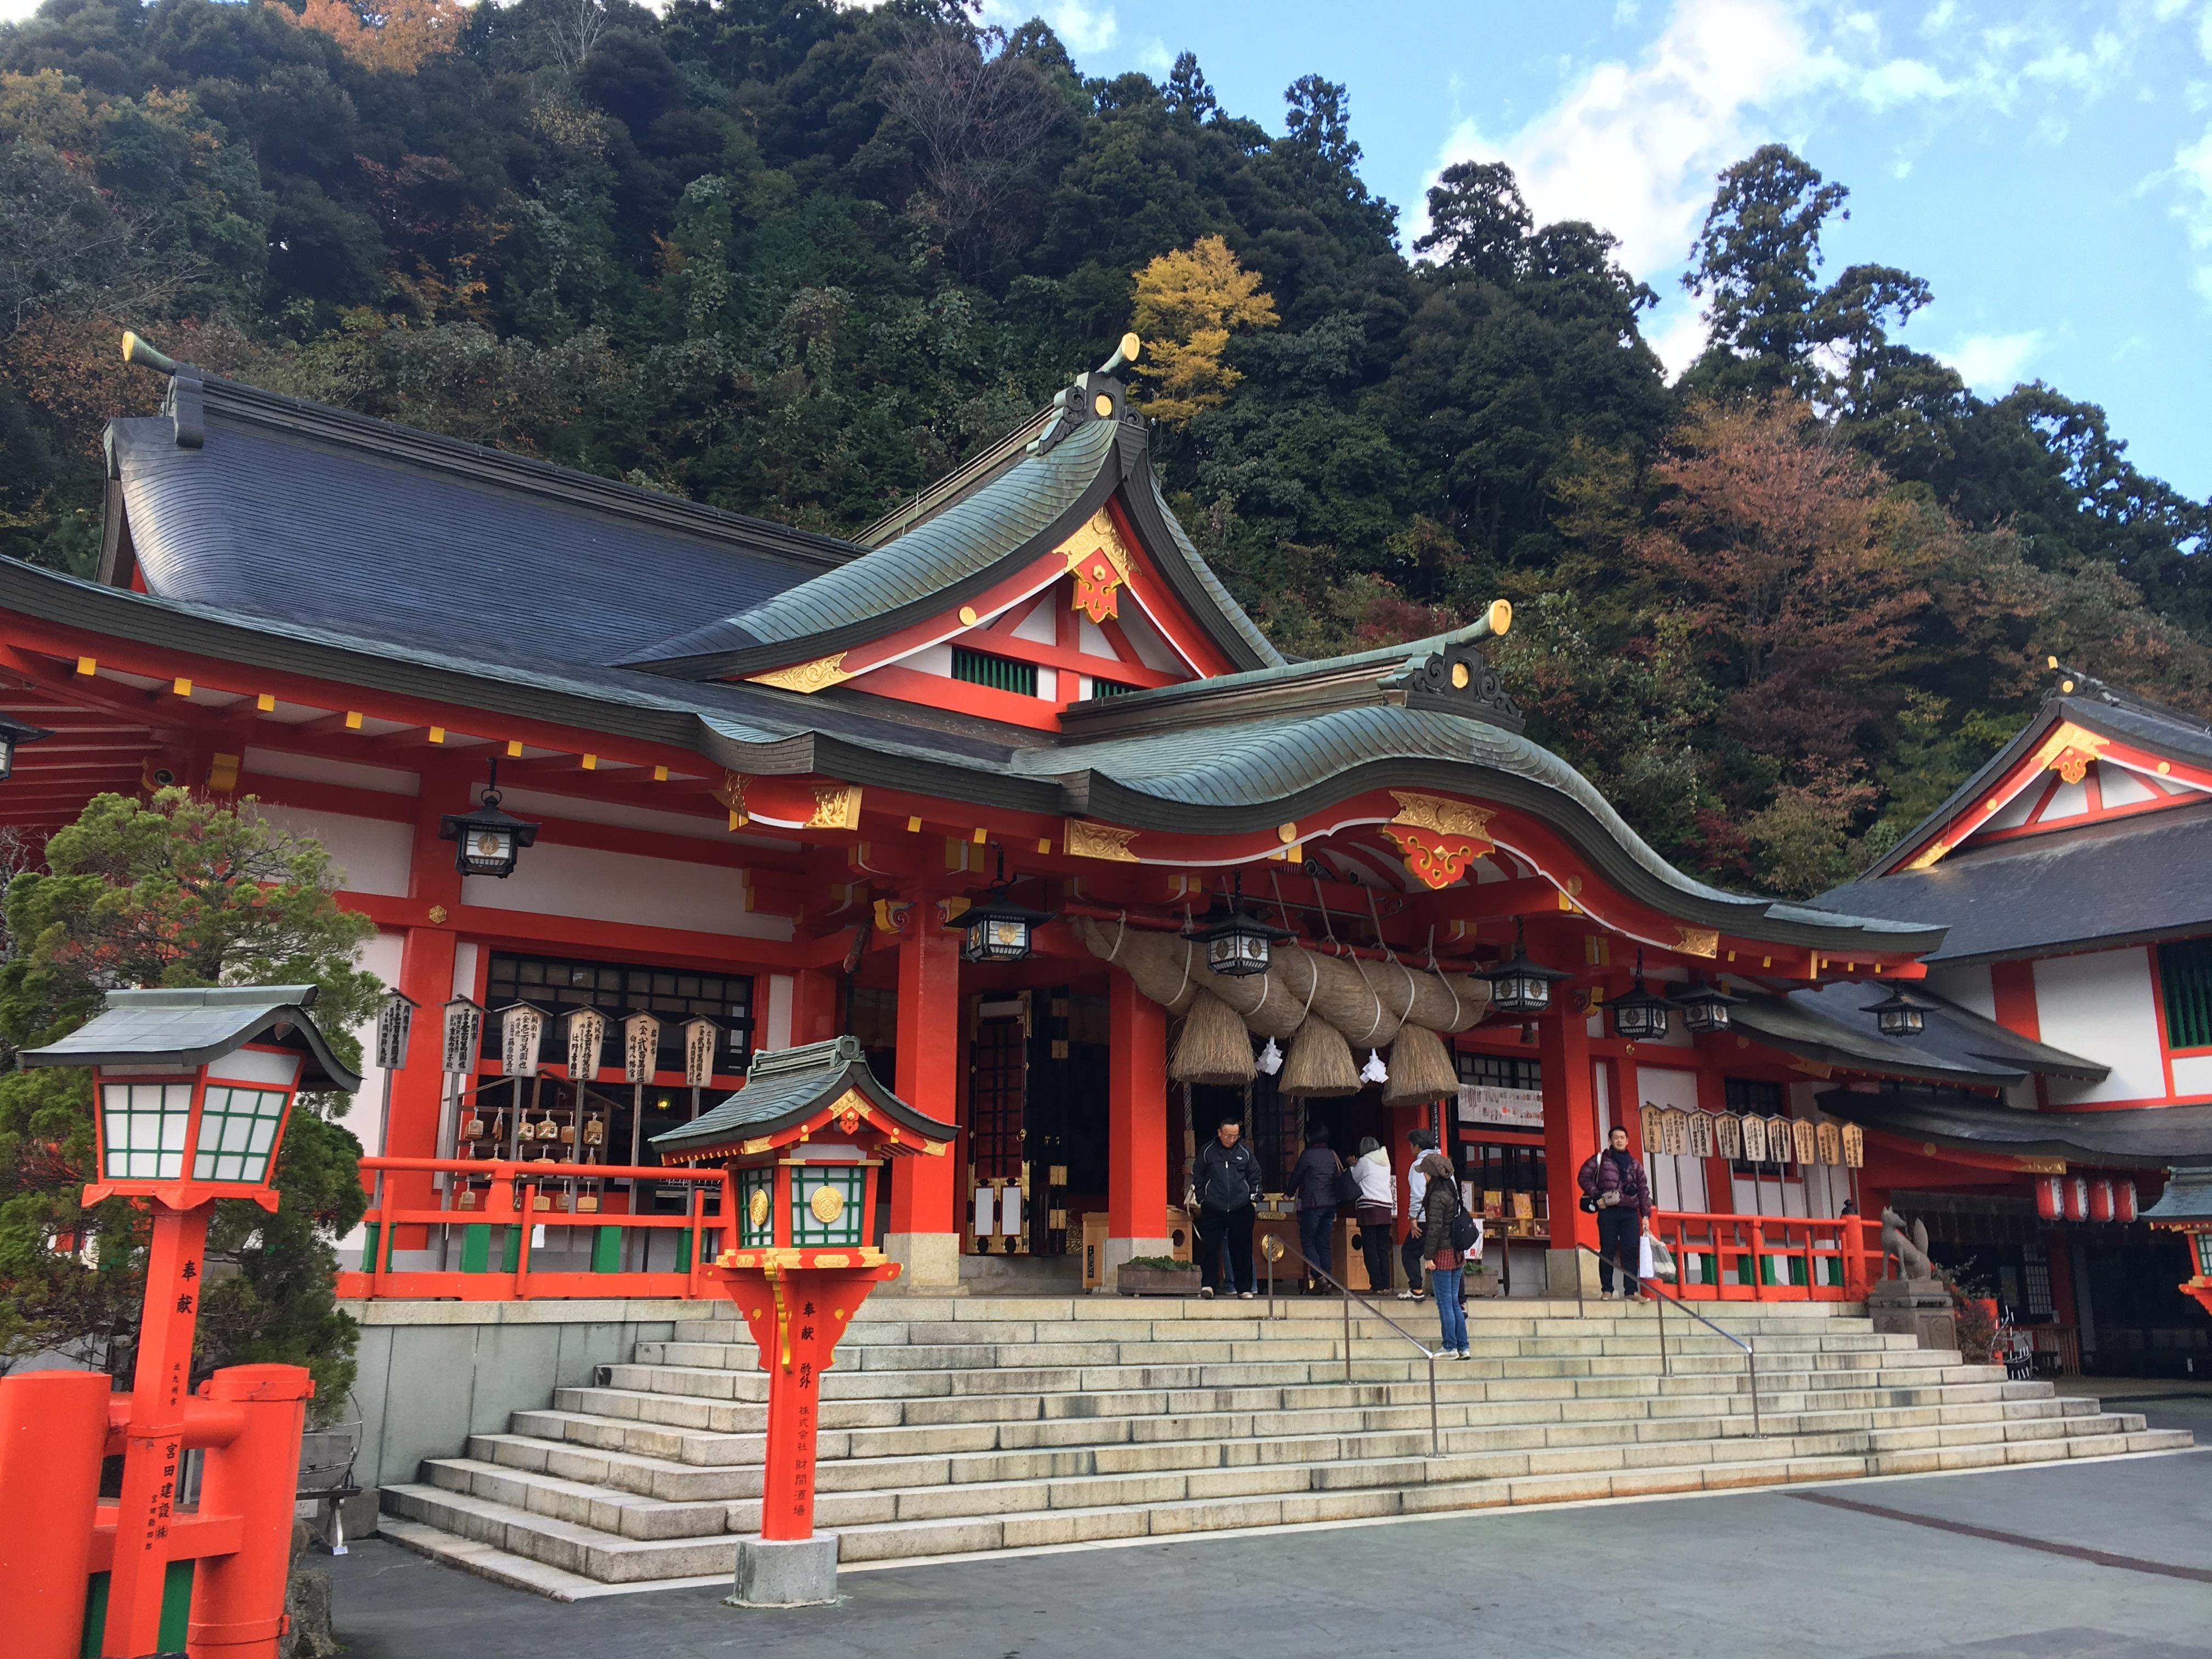 太鼓谷稲成神社や津和野城跡!日本遺産の城下町殿町通りを散策